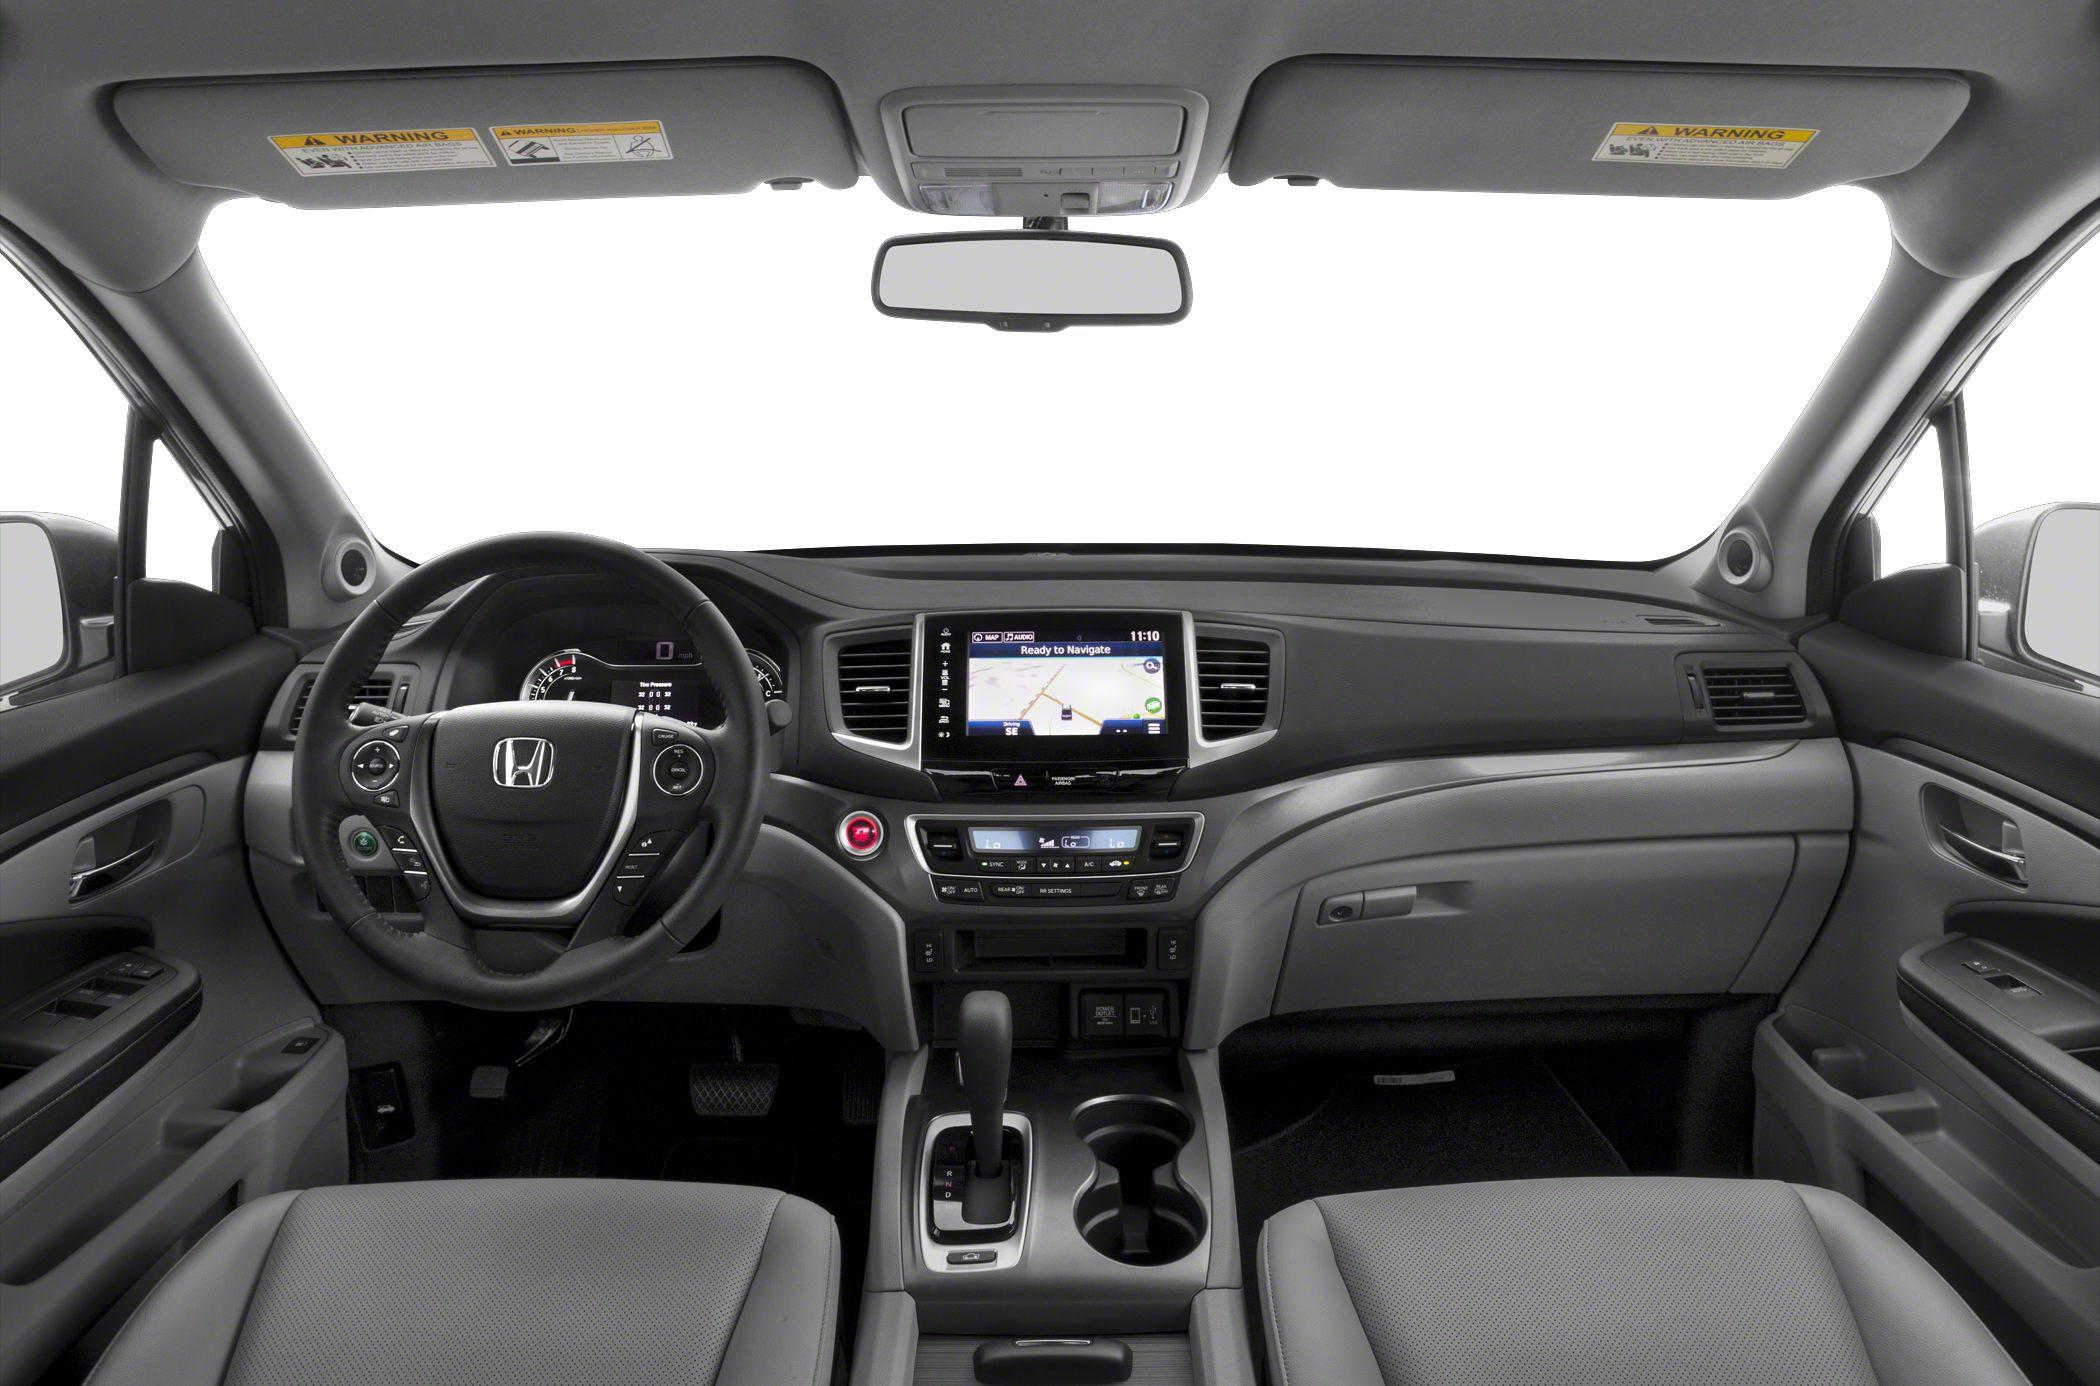 2017 honda ridgeline deals prices incentives leases - 2017 honda ridgeline rts interior ...